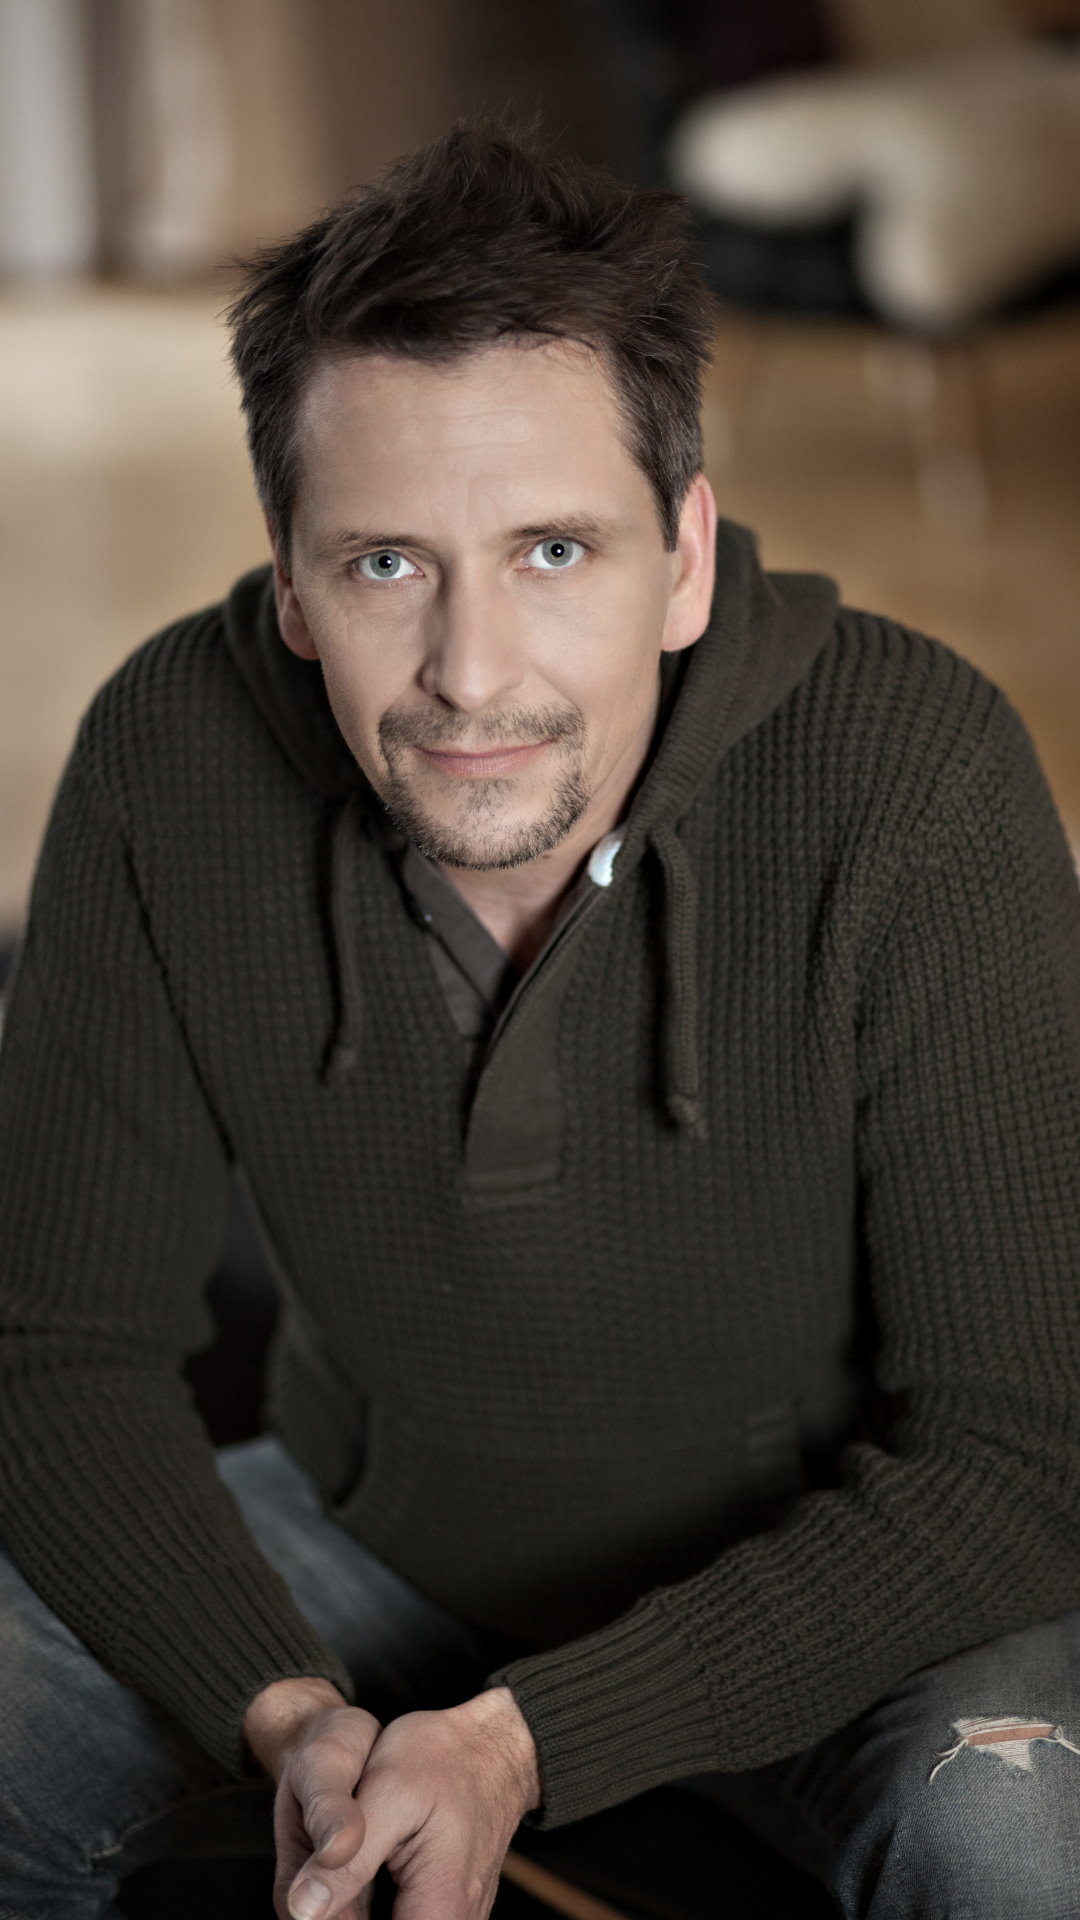 Michael Fleddermann